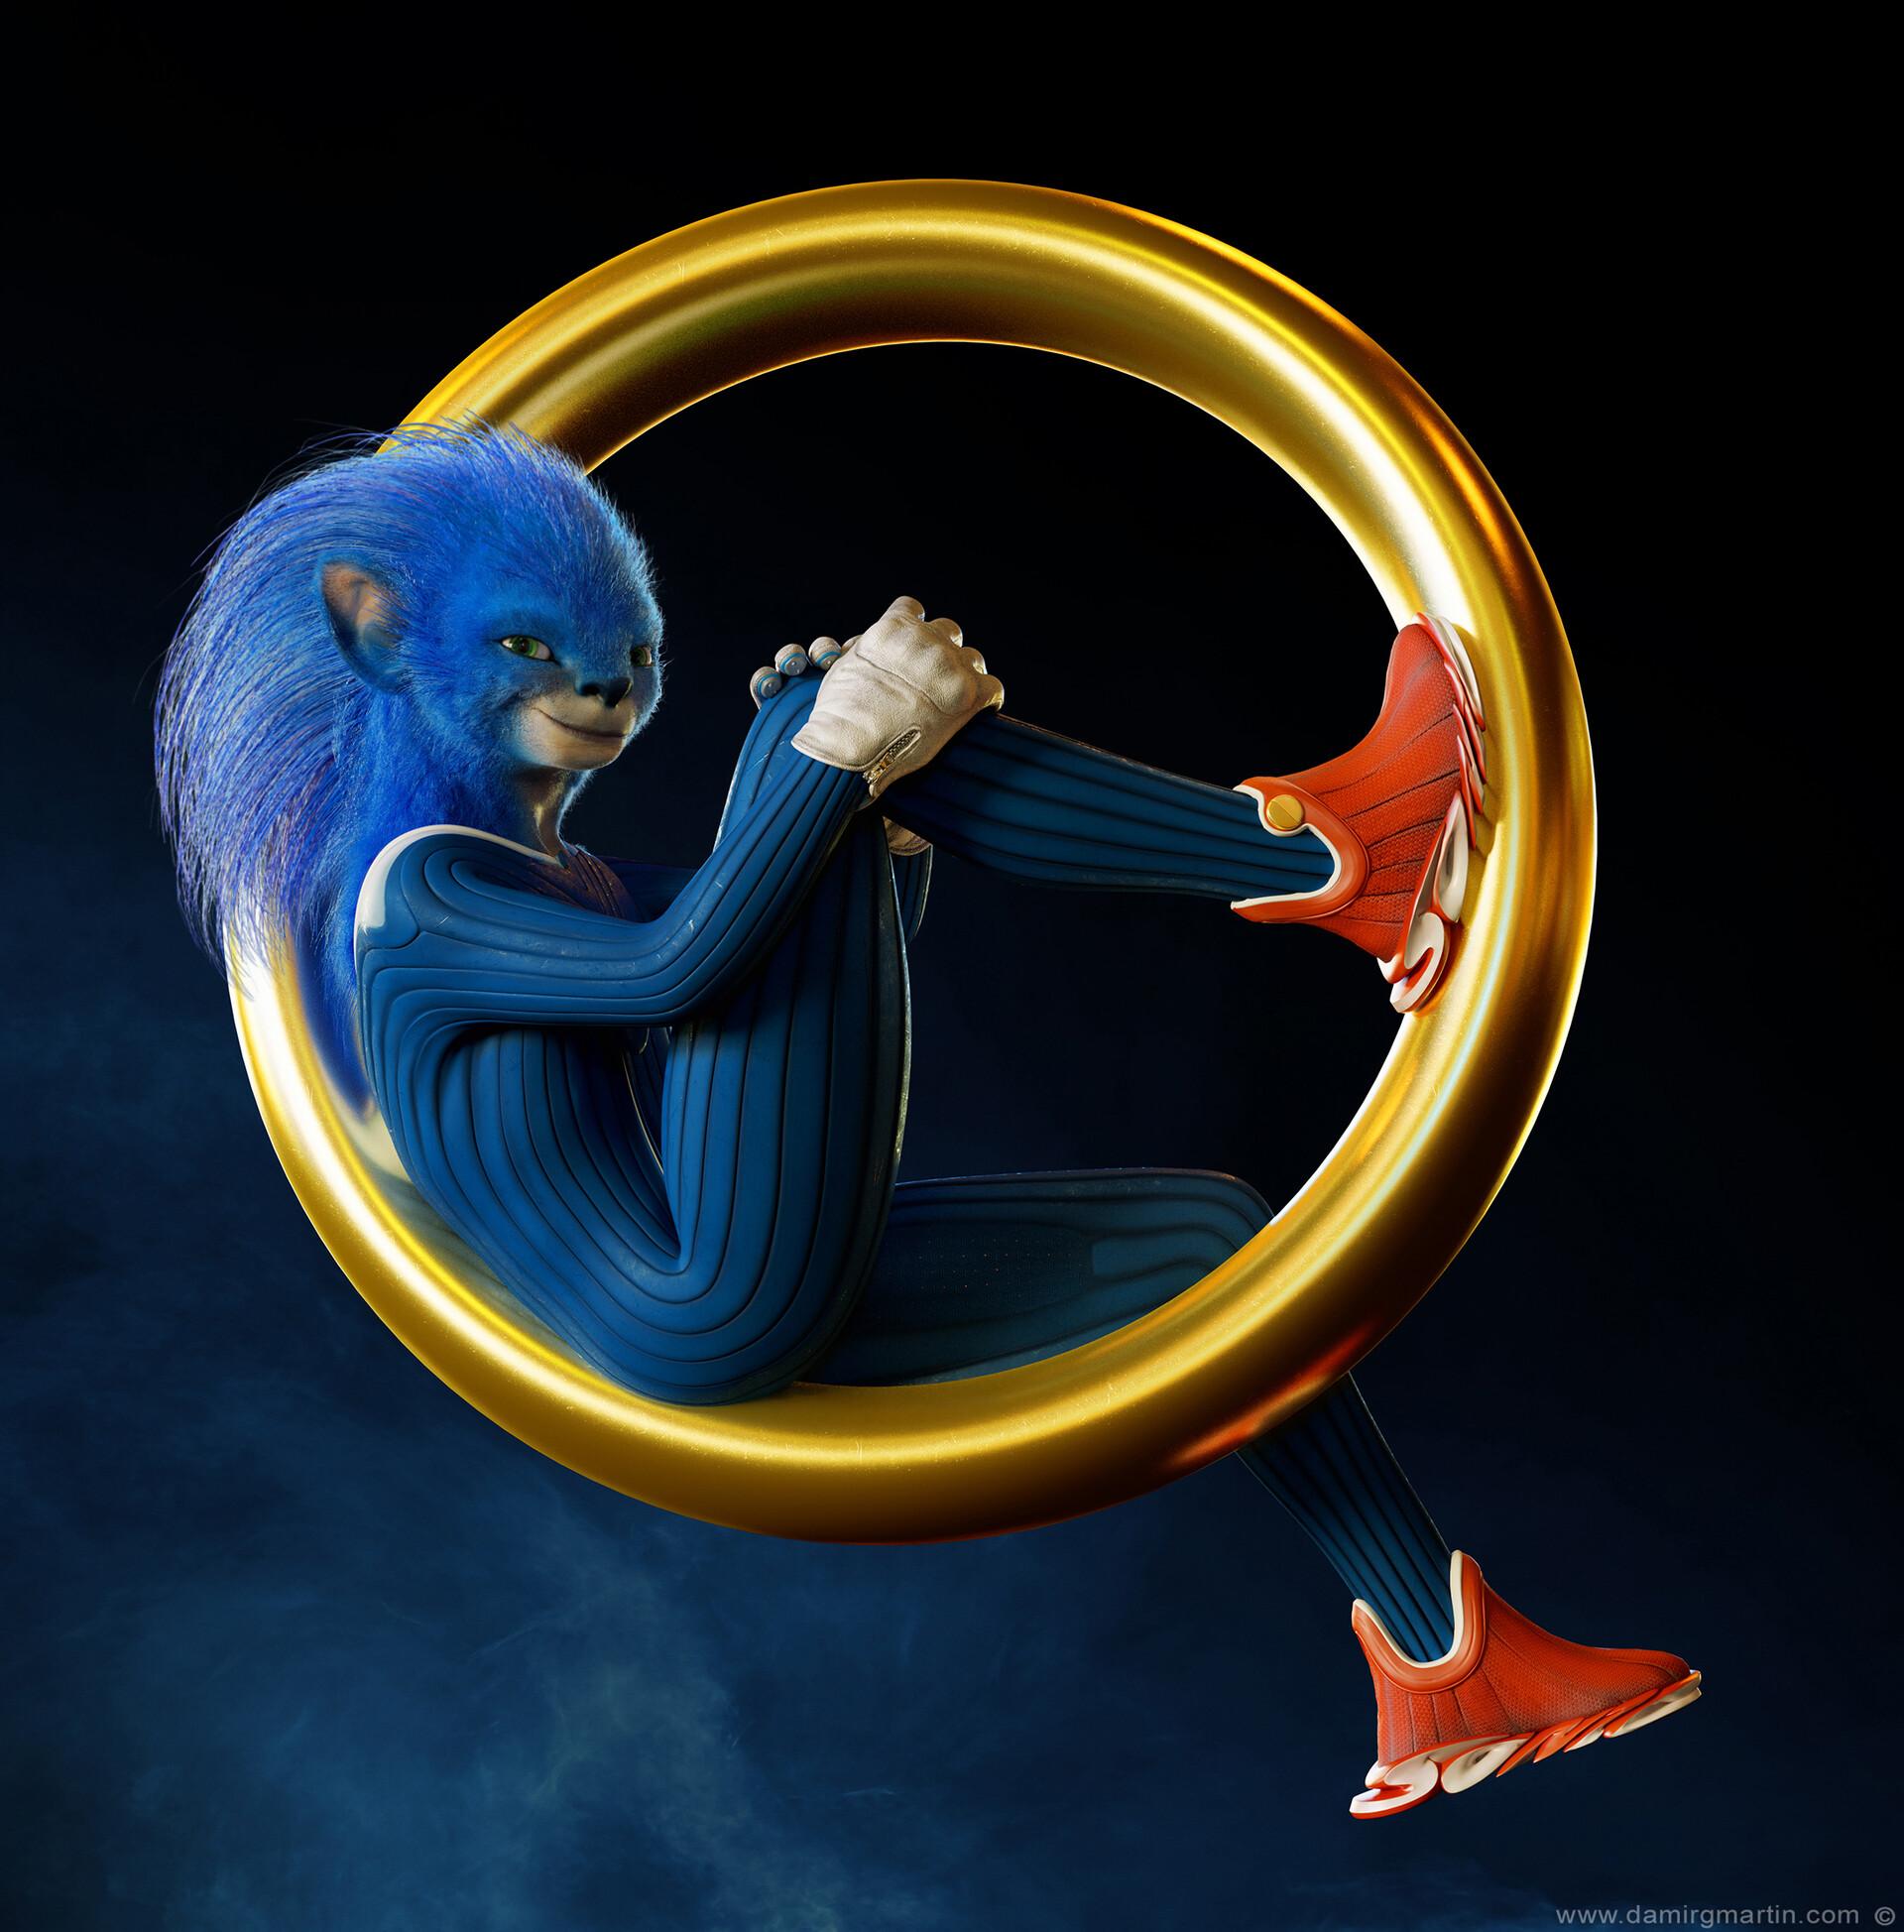 Artstation Realistic Sonic Movie Character Design Attempt Damir G Martin